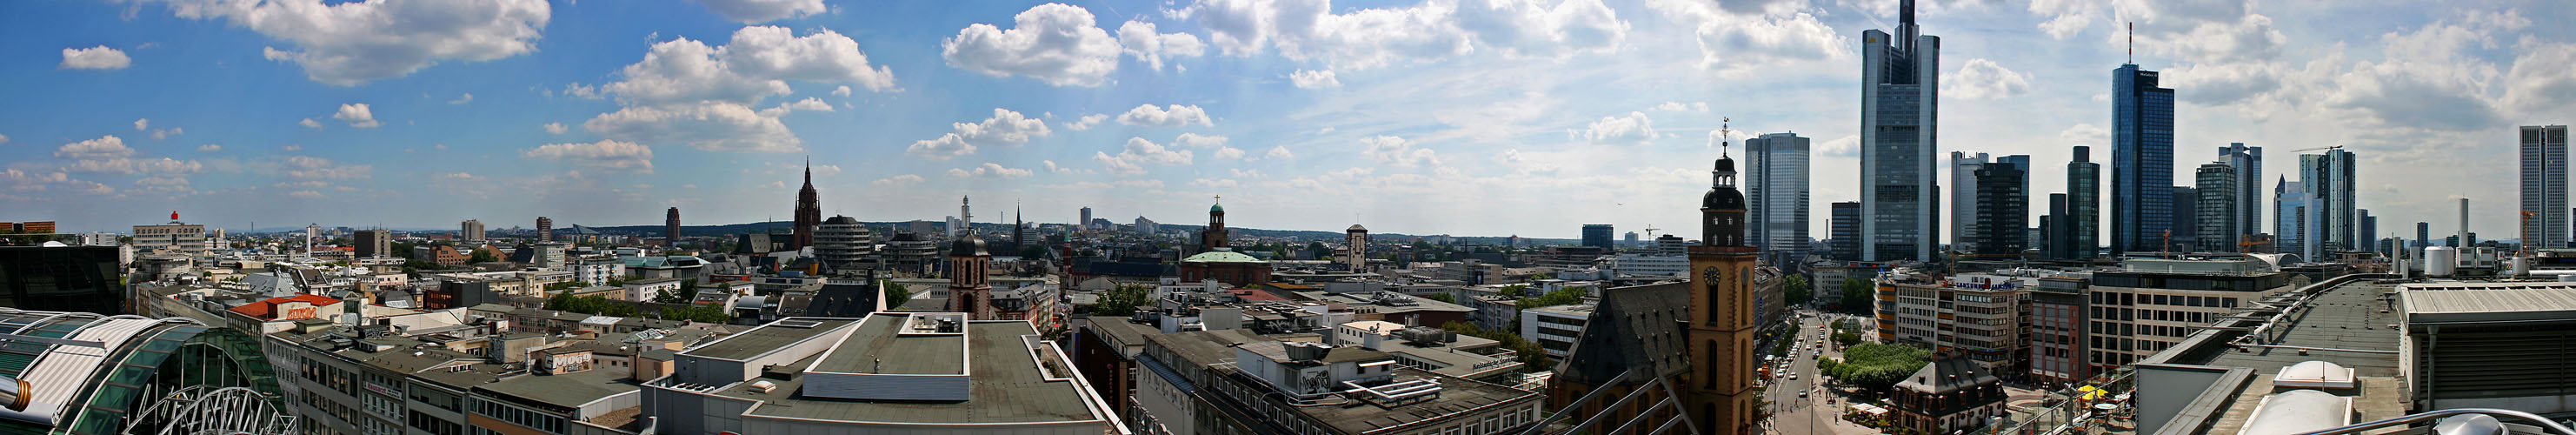 Frankfurter Skyline 2